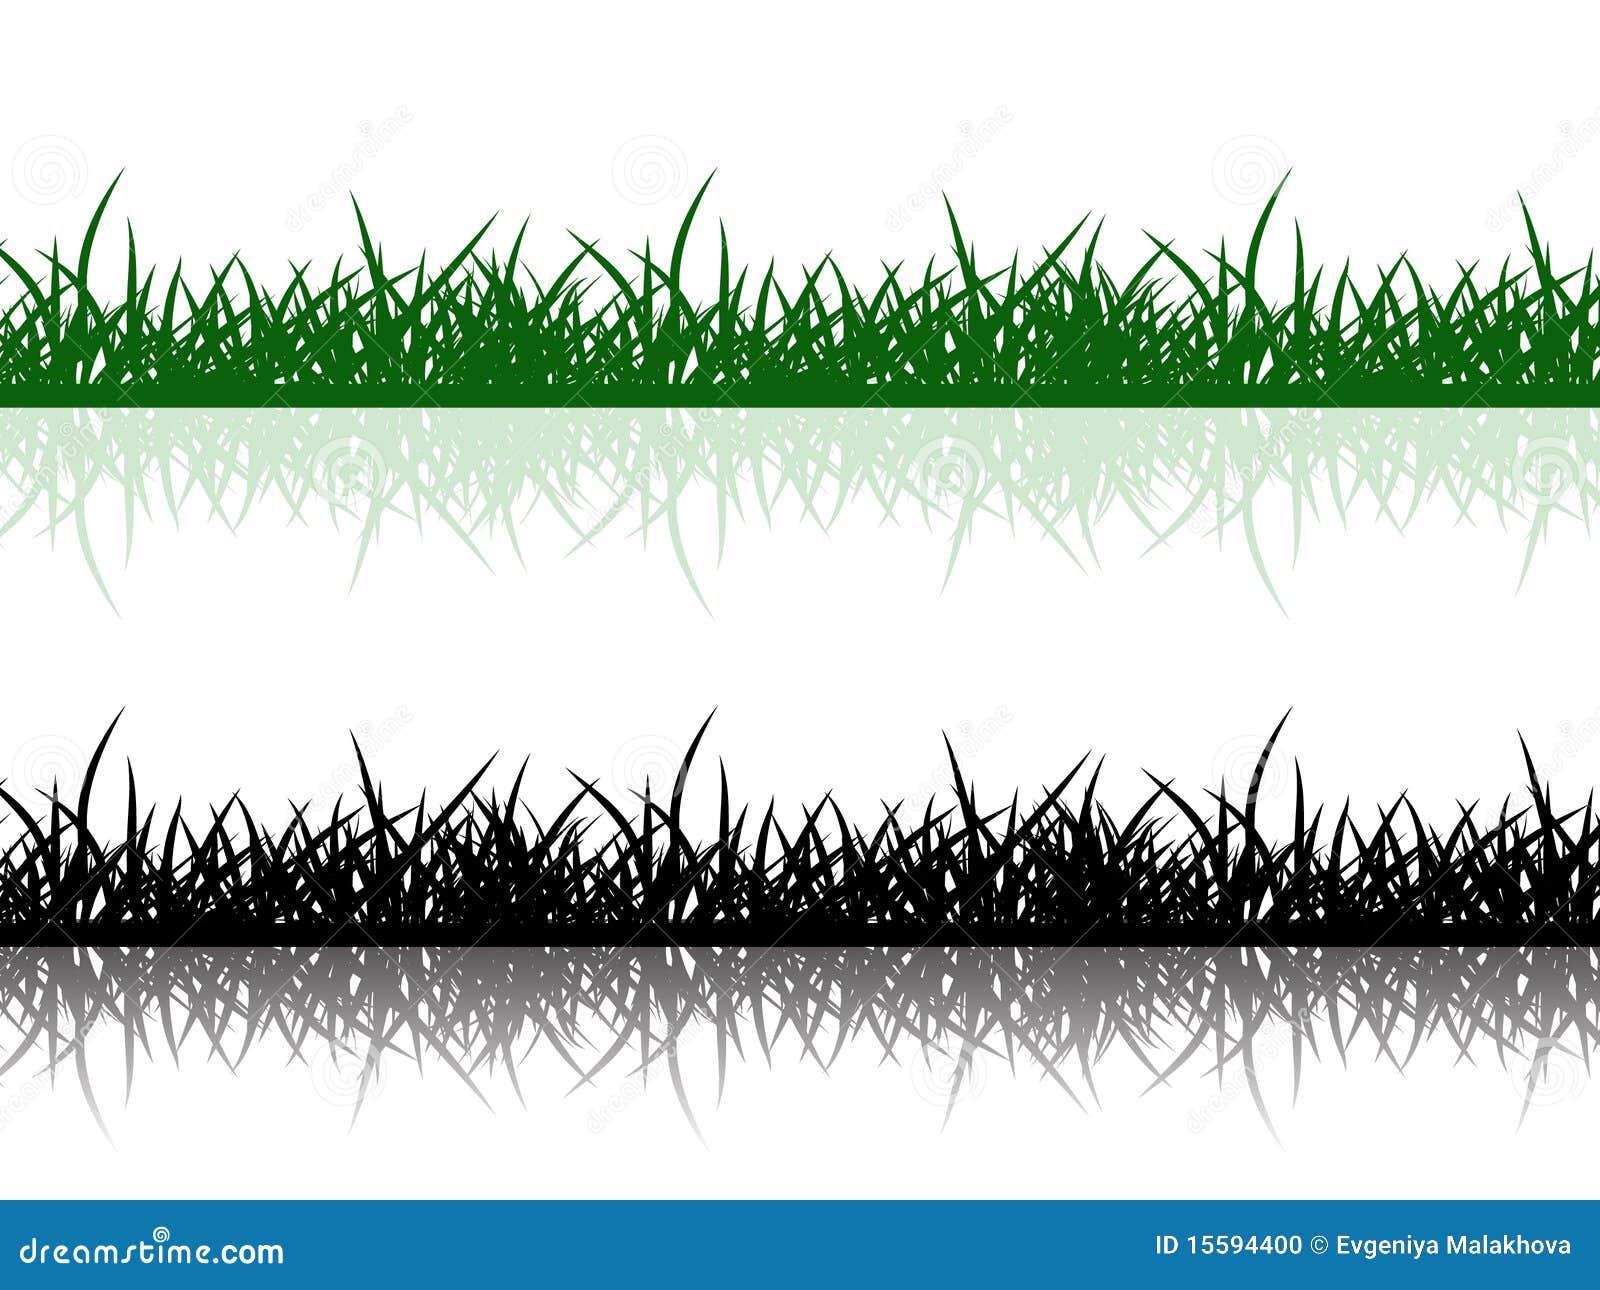 Grass border stock photo image 15594400 for Grass border